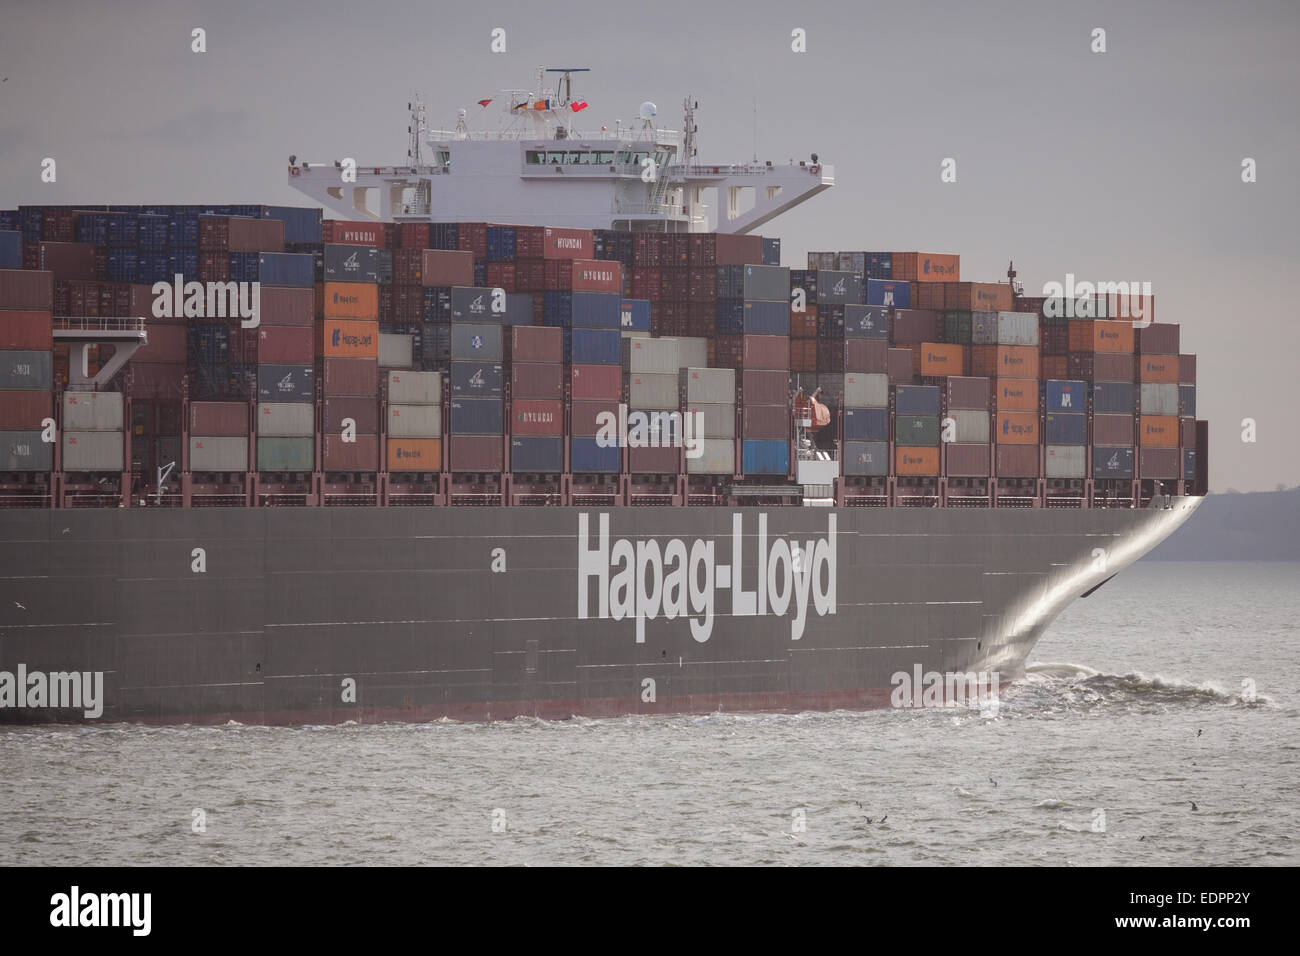 The Hapag-Lloyds cargo ship, Essen Express departing Southampton. - Stock Image